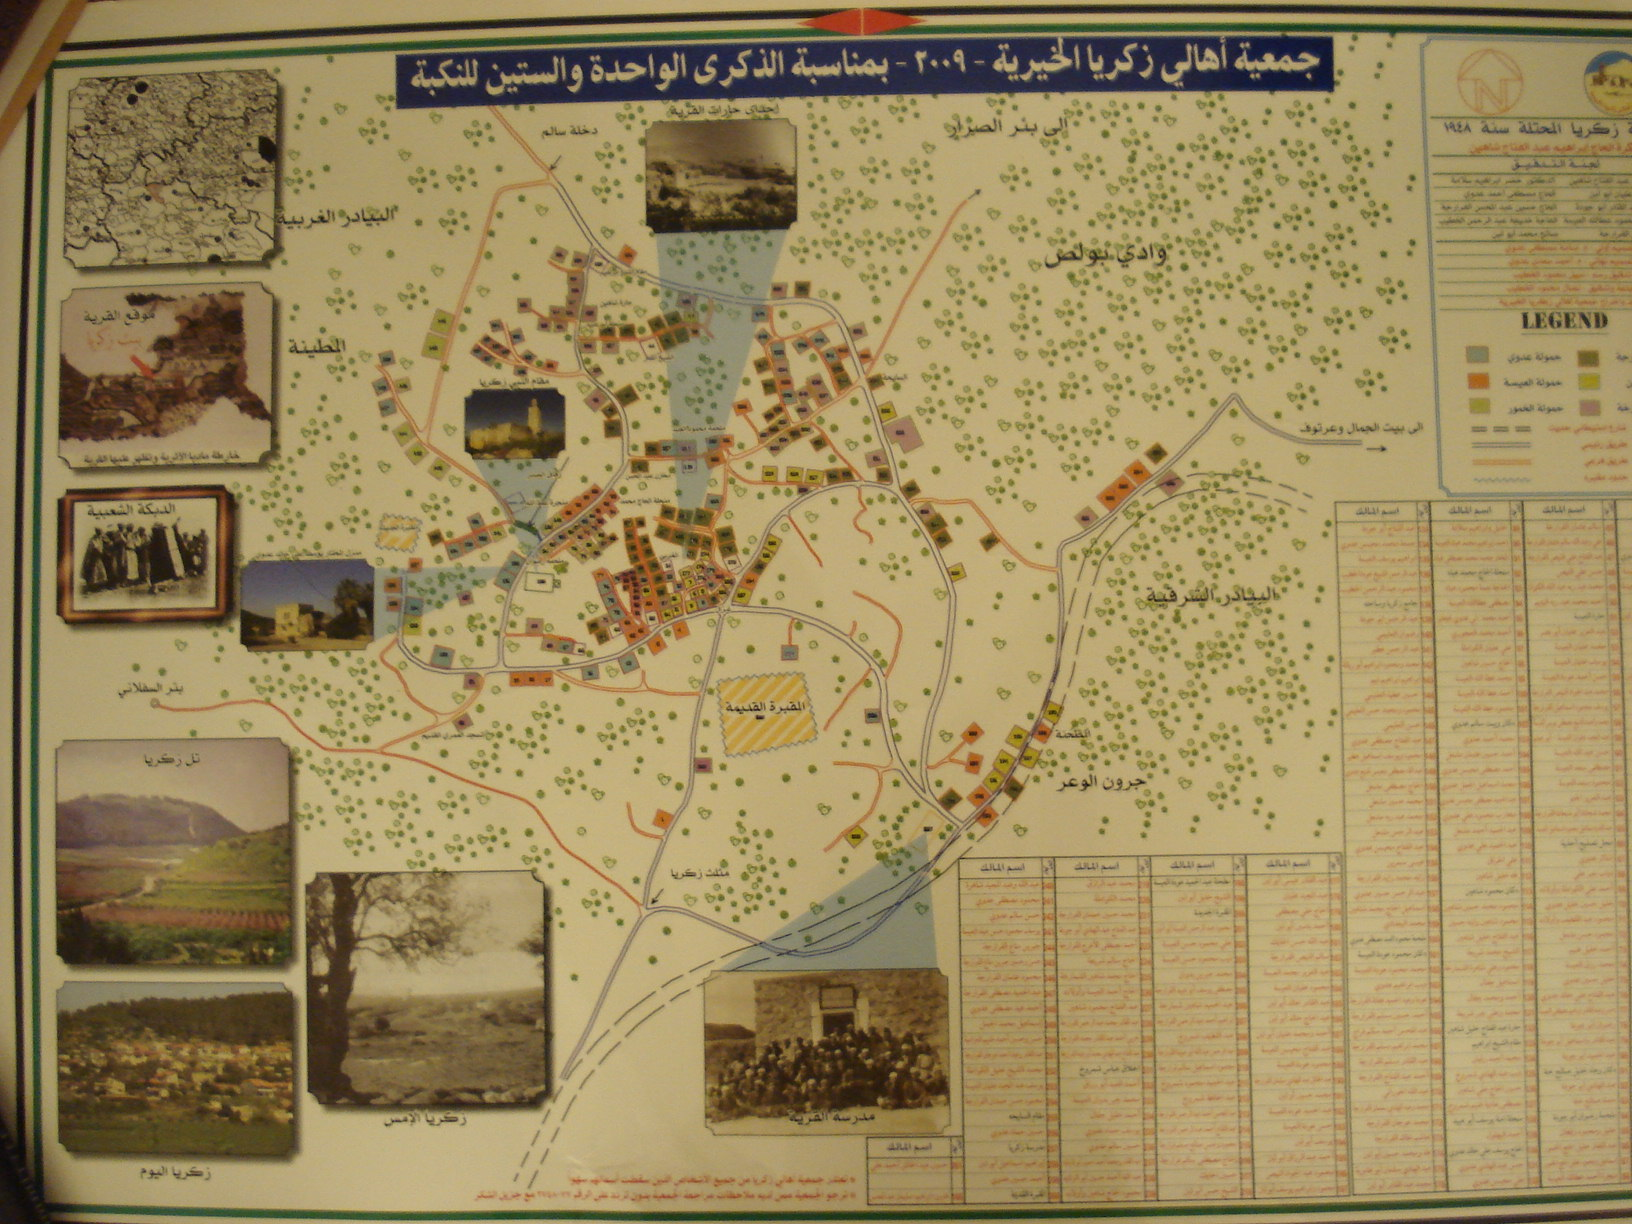 a map of zakariya village